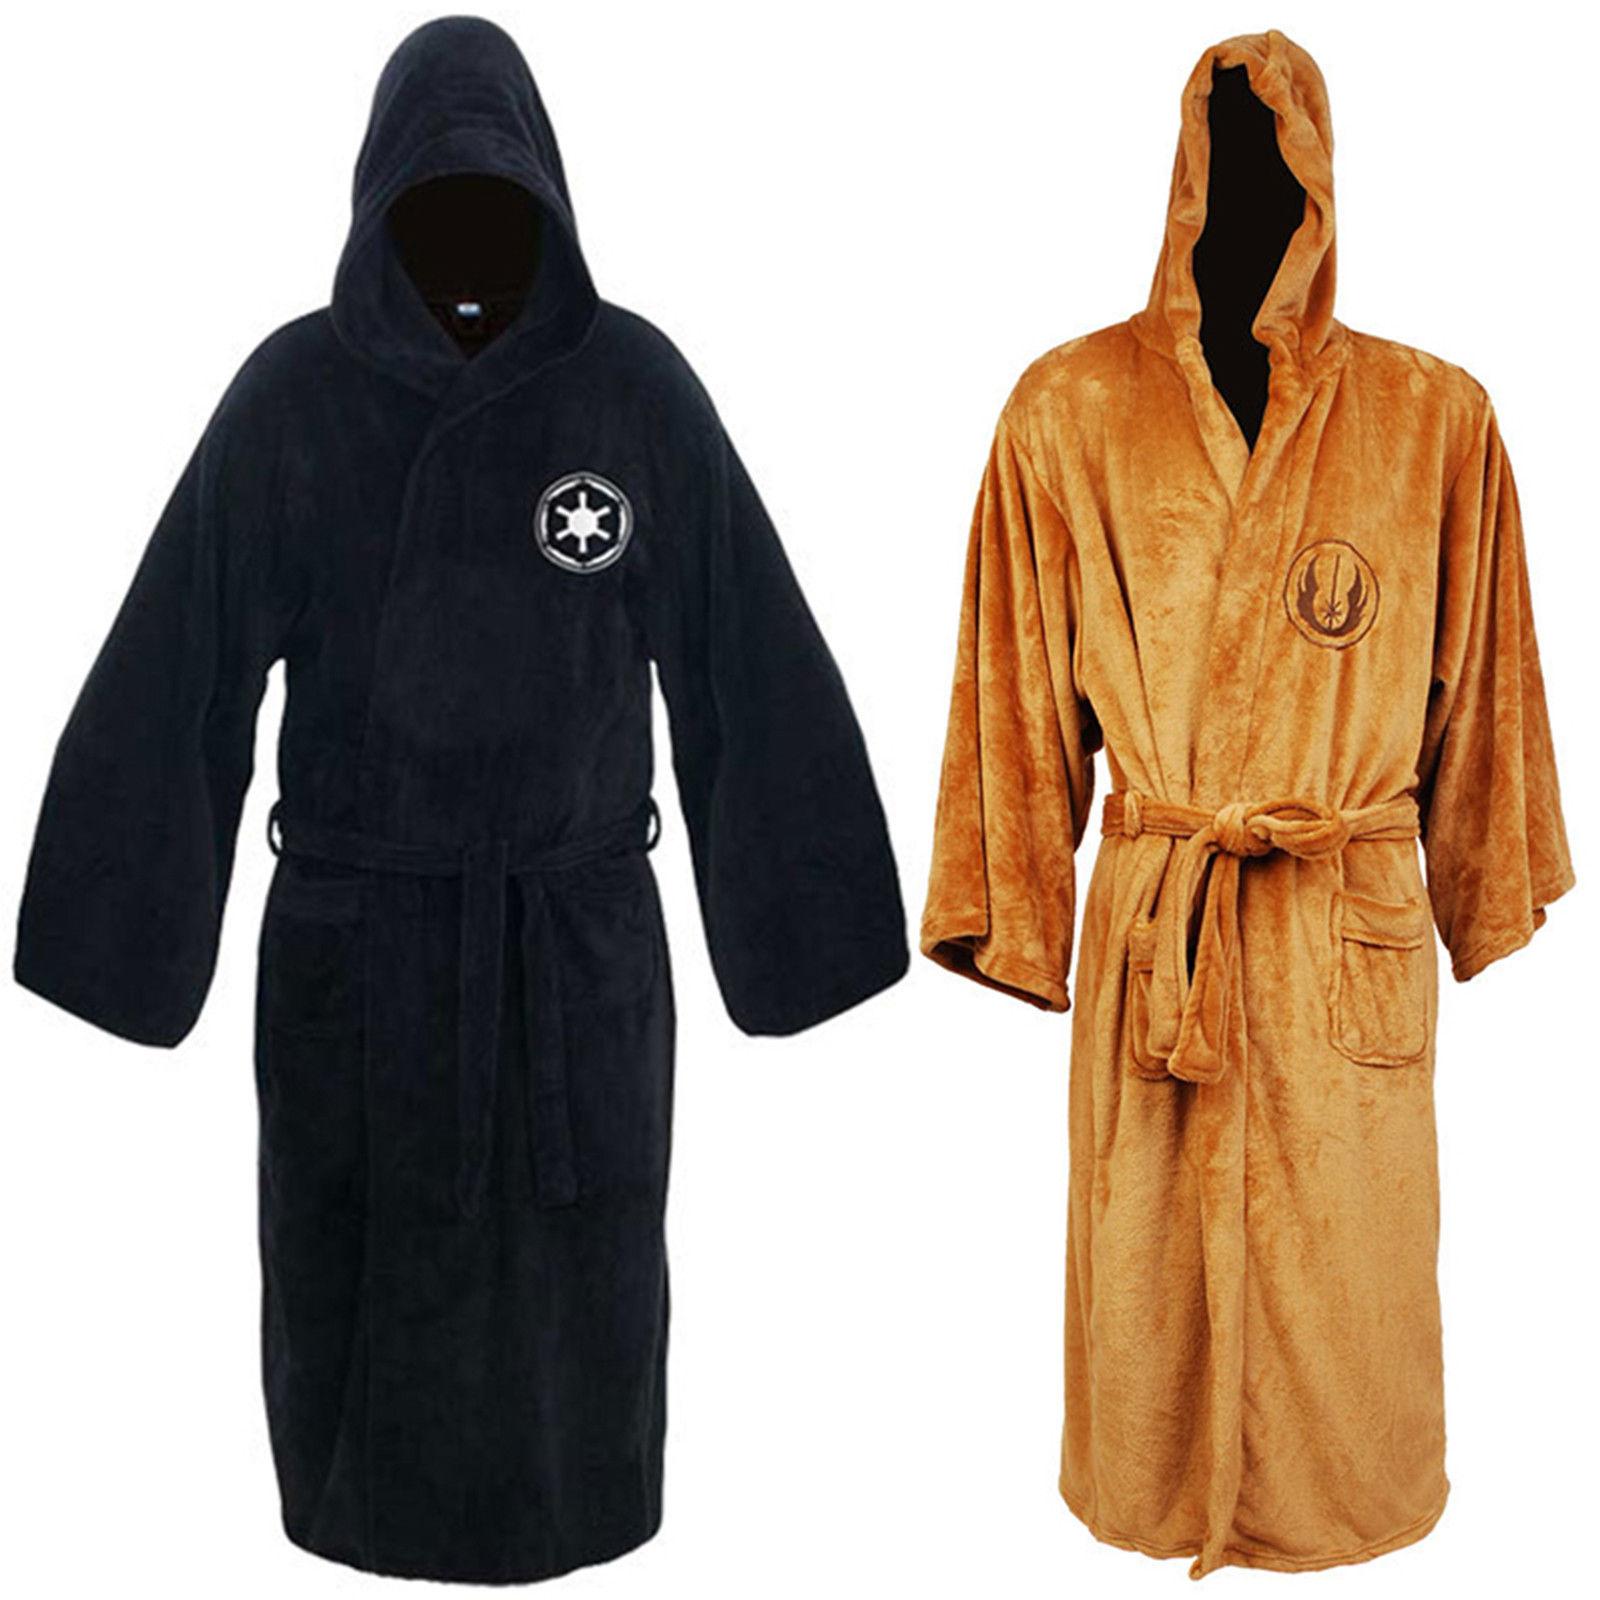 Star wars mantel kopen